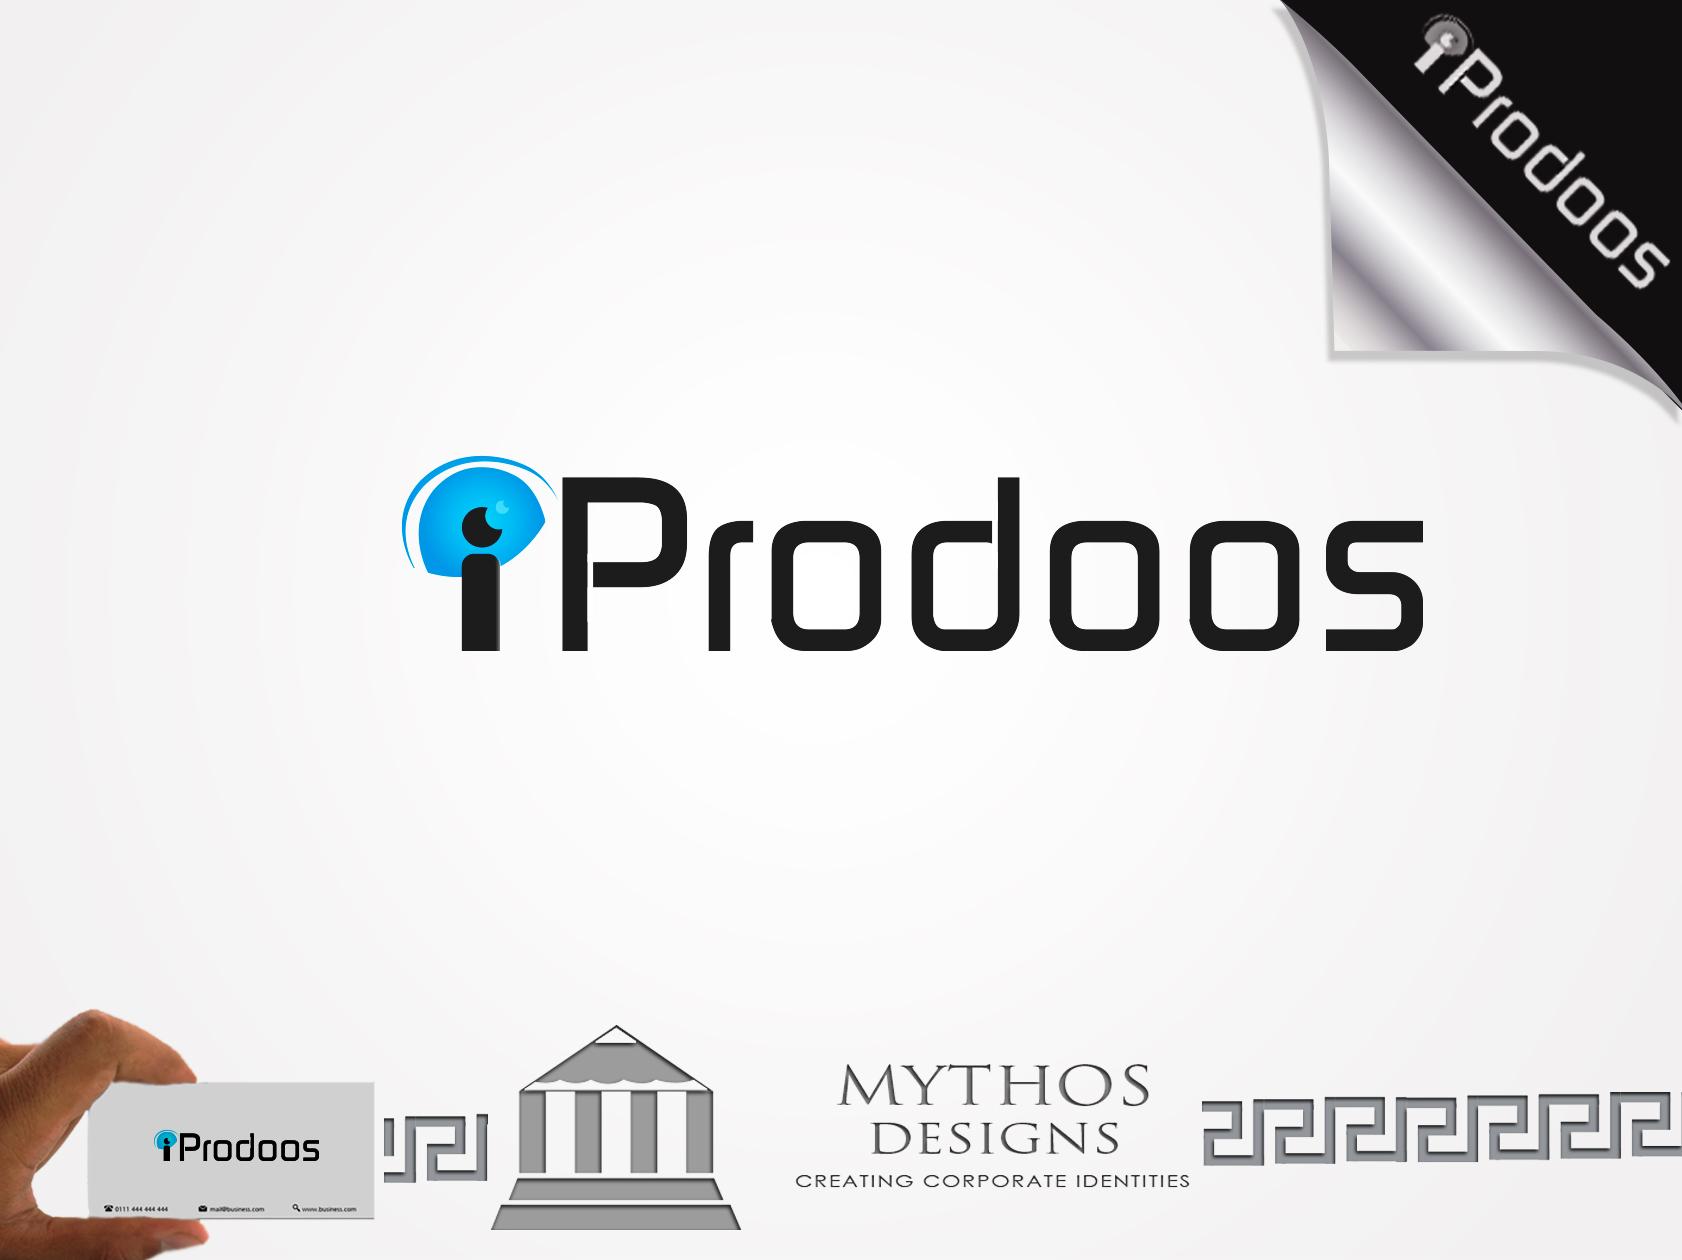 Logo Design by Mythos Designs - Entry No. 14 in the Logo Design Contest New Logo Design for iProdoos.